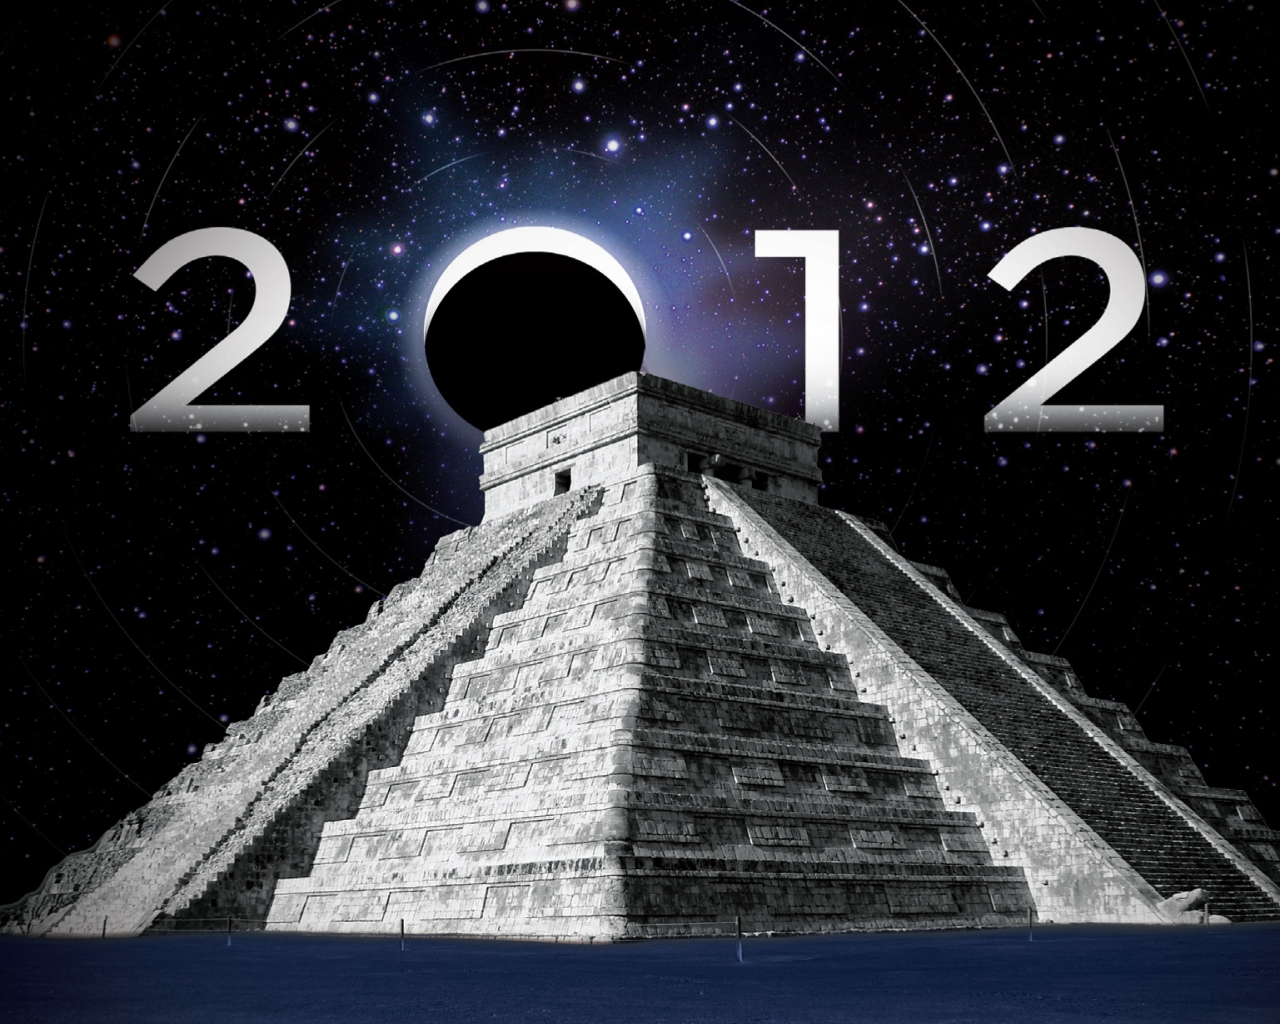 http://3.bp.blogspot.com/-fGl6TsrOFdE/TuzKZJf3ppI/AAAAAAAAD7o/-D7FxIpY-28/s1600/2012-wallpaper.jpg